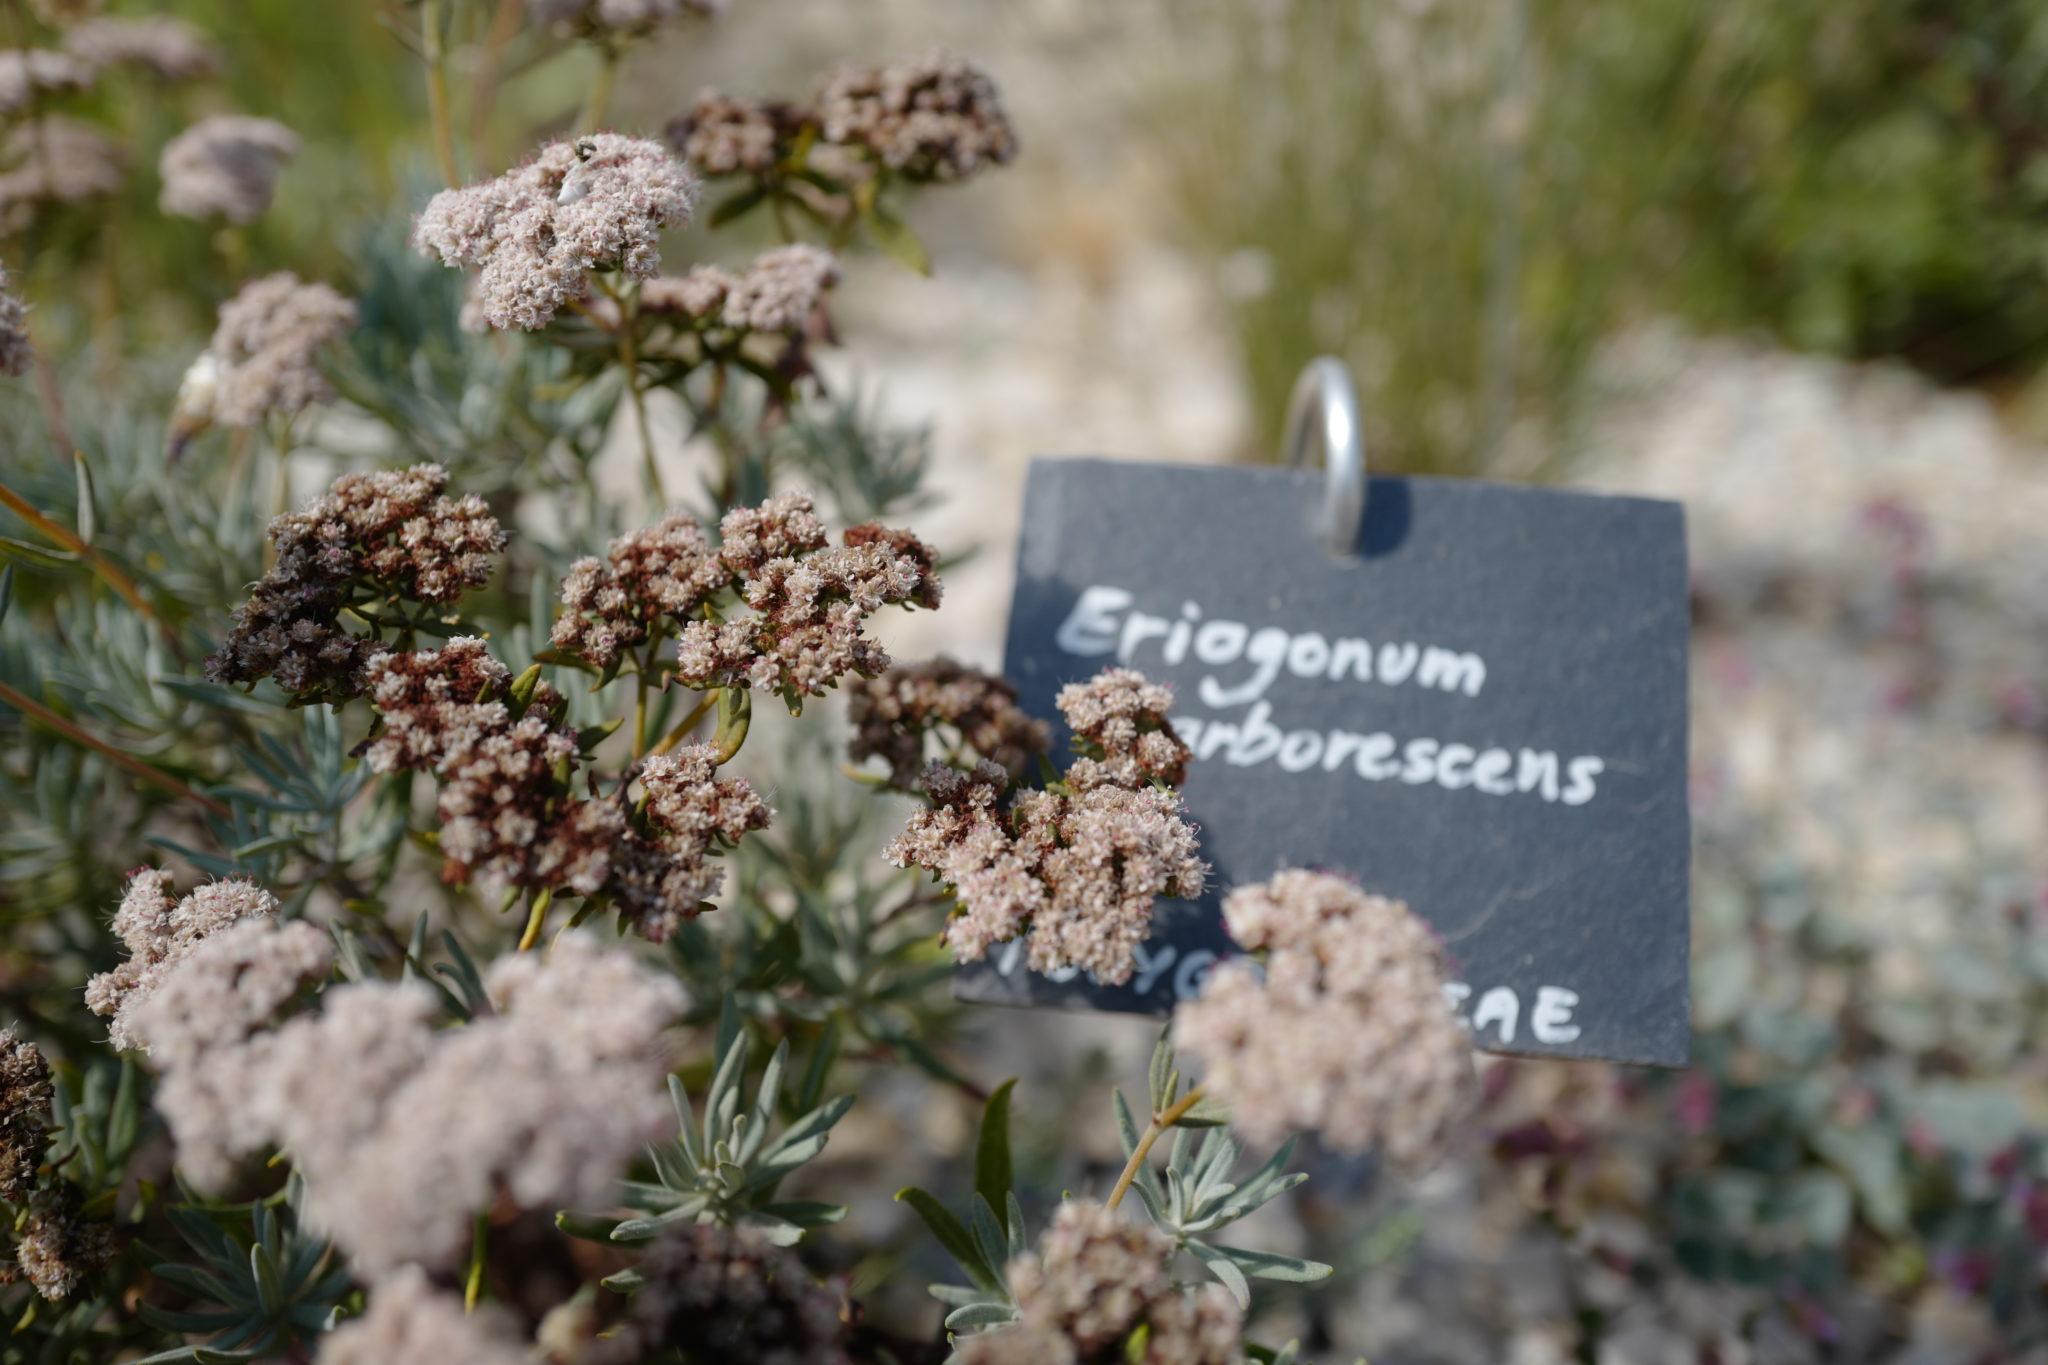 Eriogonum arborescens @vmure Sentier botanique Abbaye St André